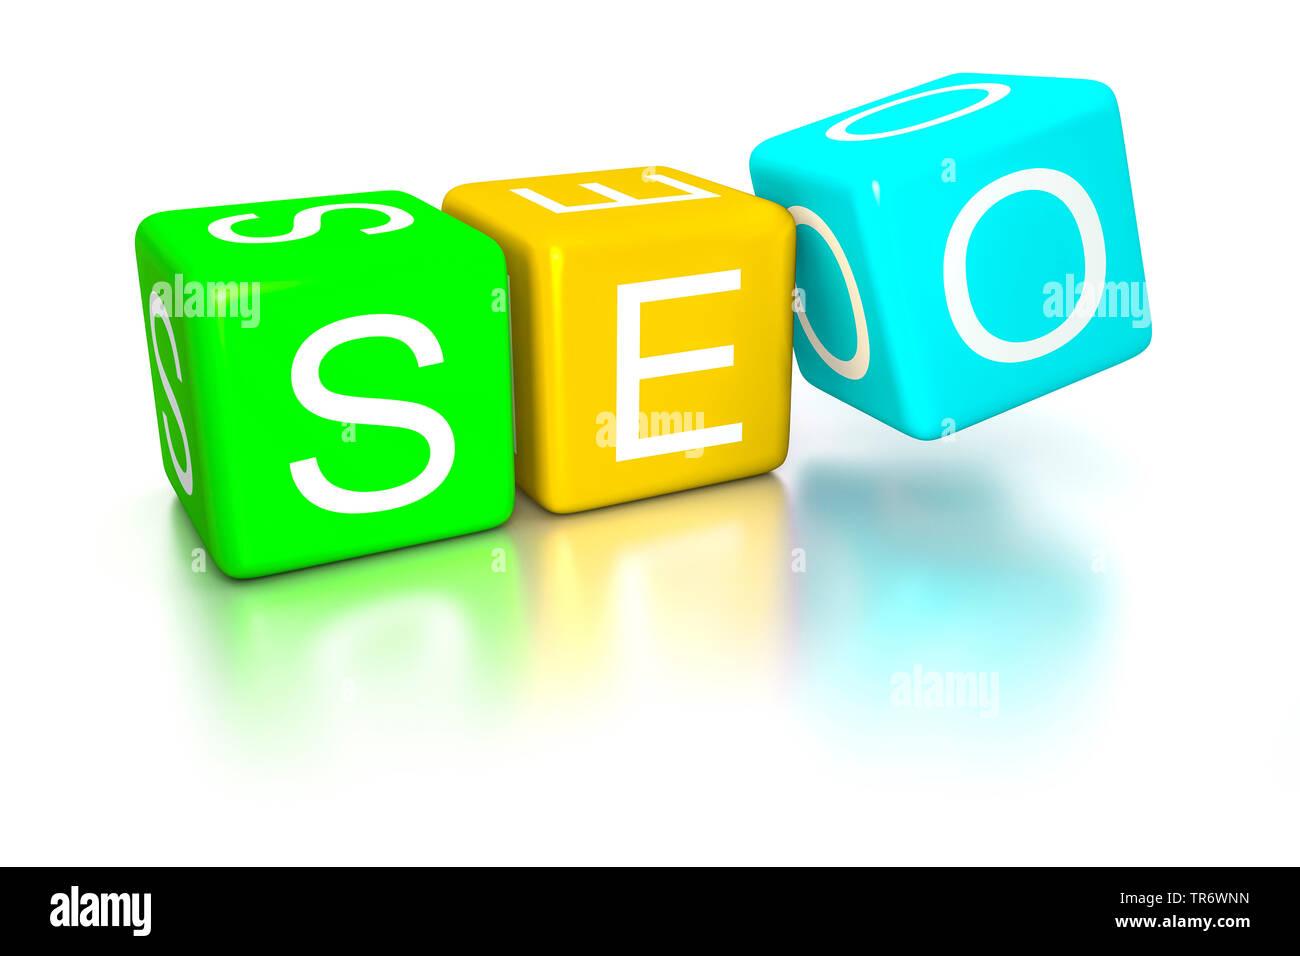 3D Computergrafik, Schriftzug SEO (Search engine optimization) in Wuerfeldarstellung, Europa | 3D computer graphic, lettering SEO (Search engine optim - Stock Image